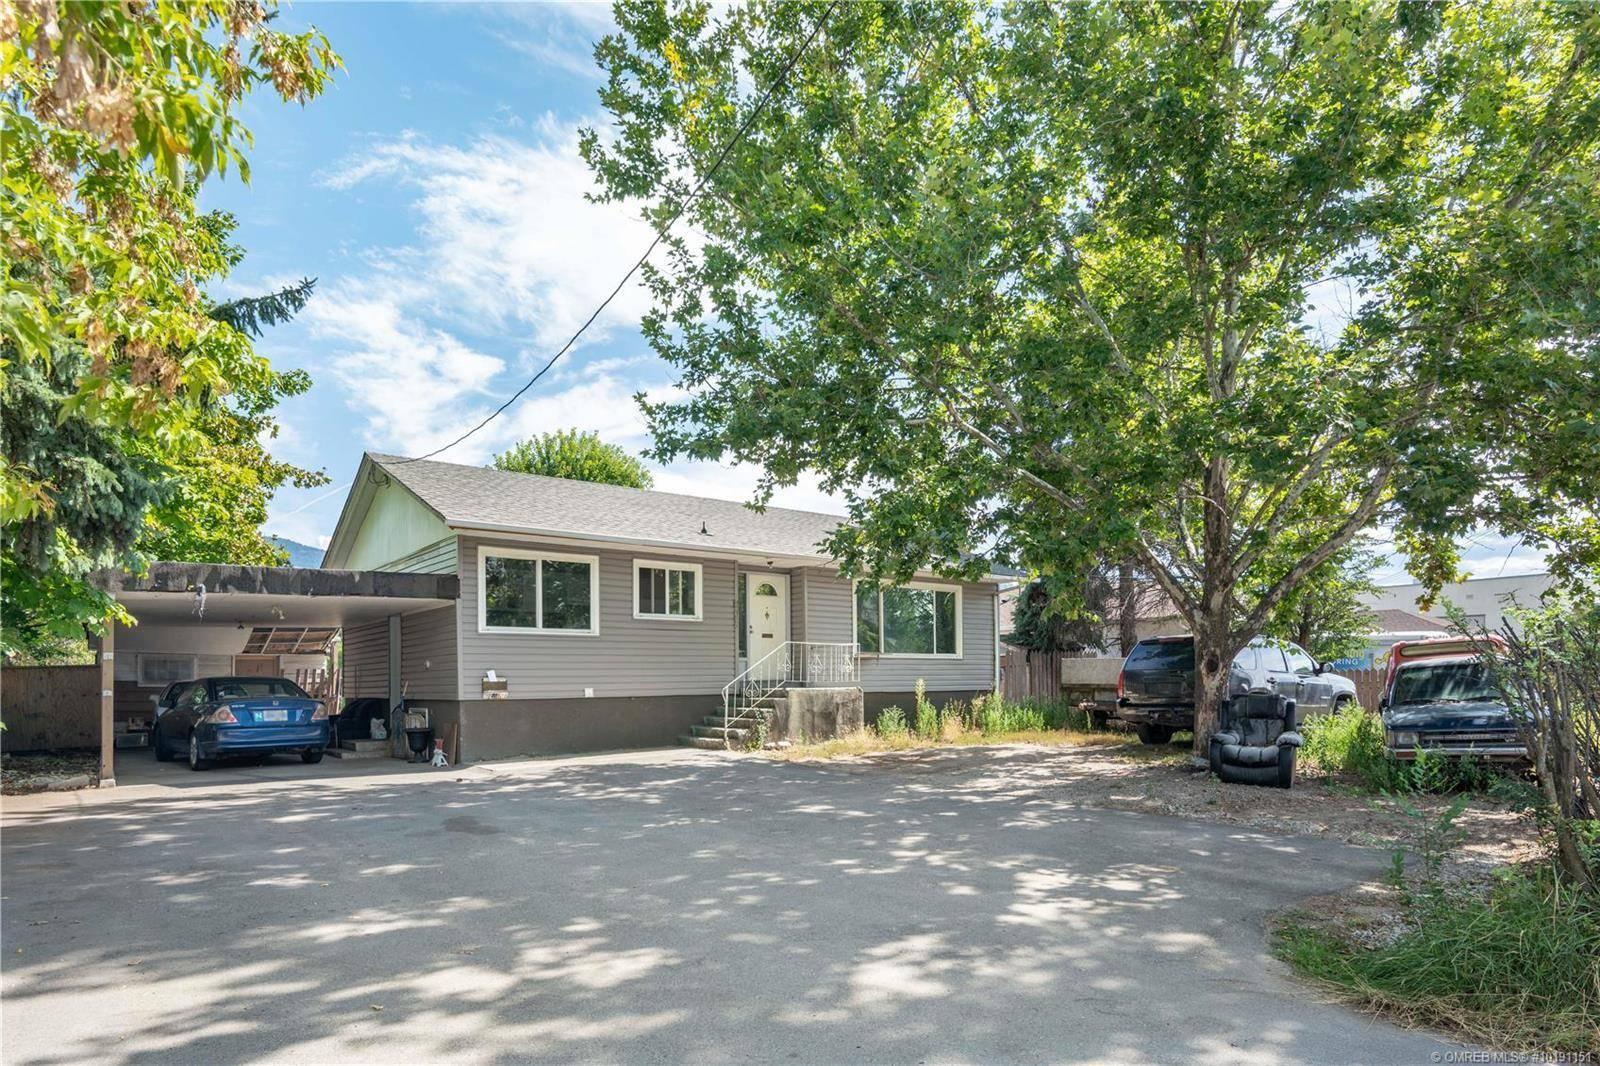 House for sale at 835 Rutland Rd North Kelowna British Columbia - MLS: 10191151